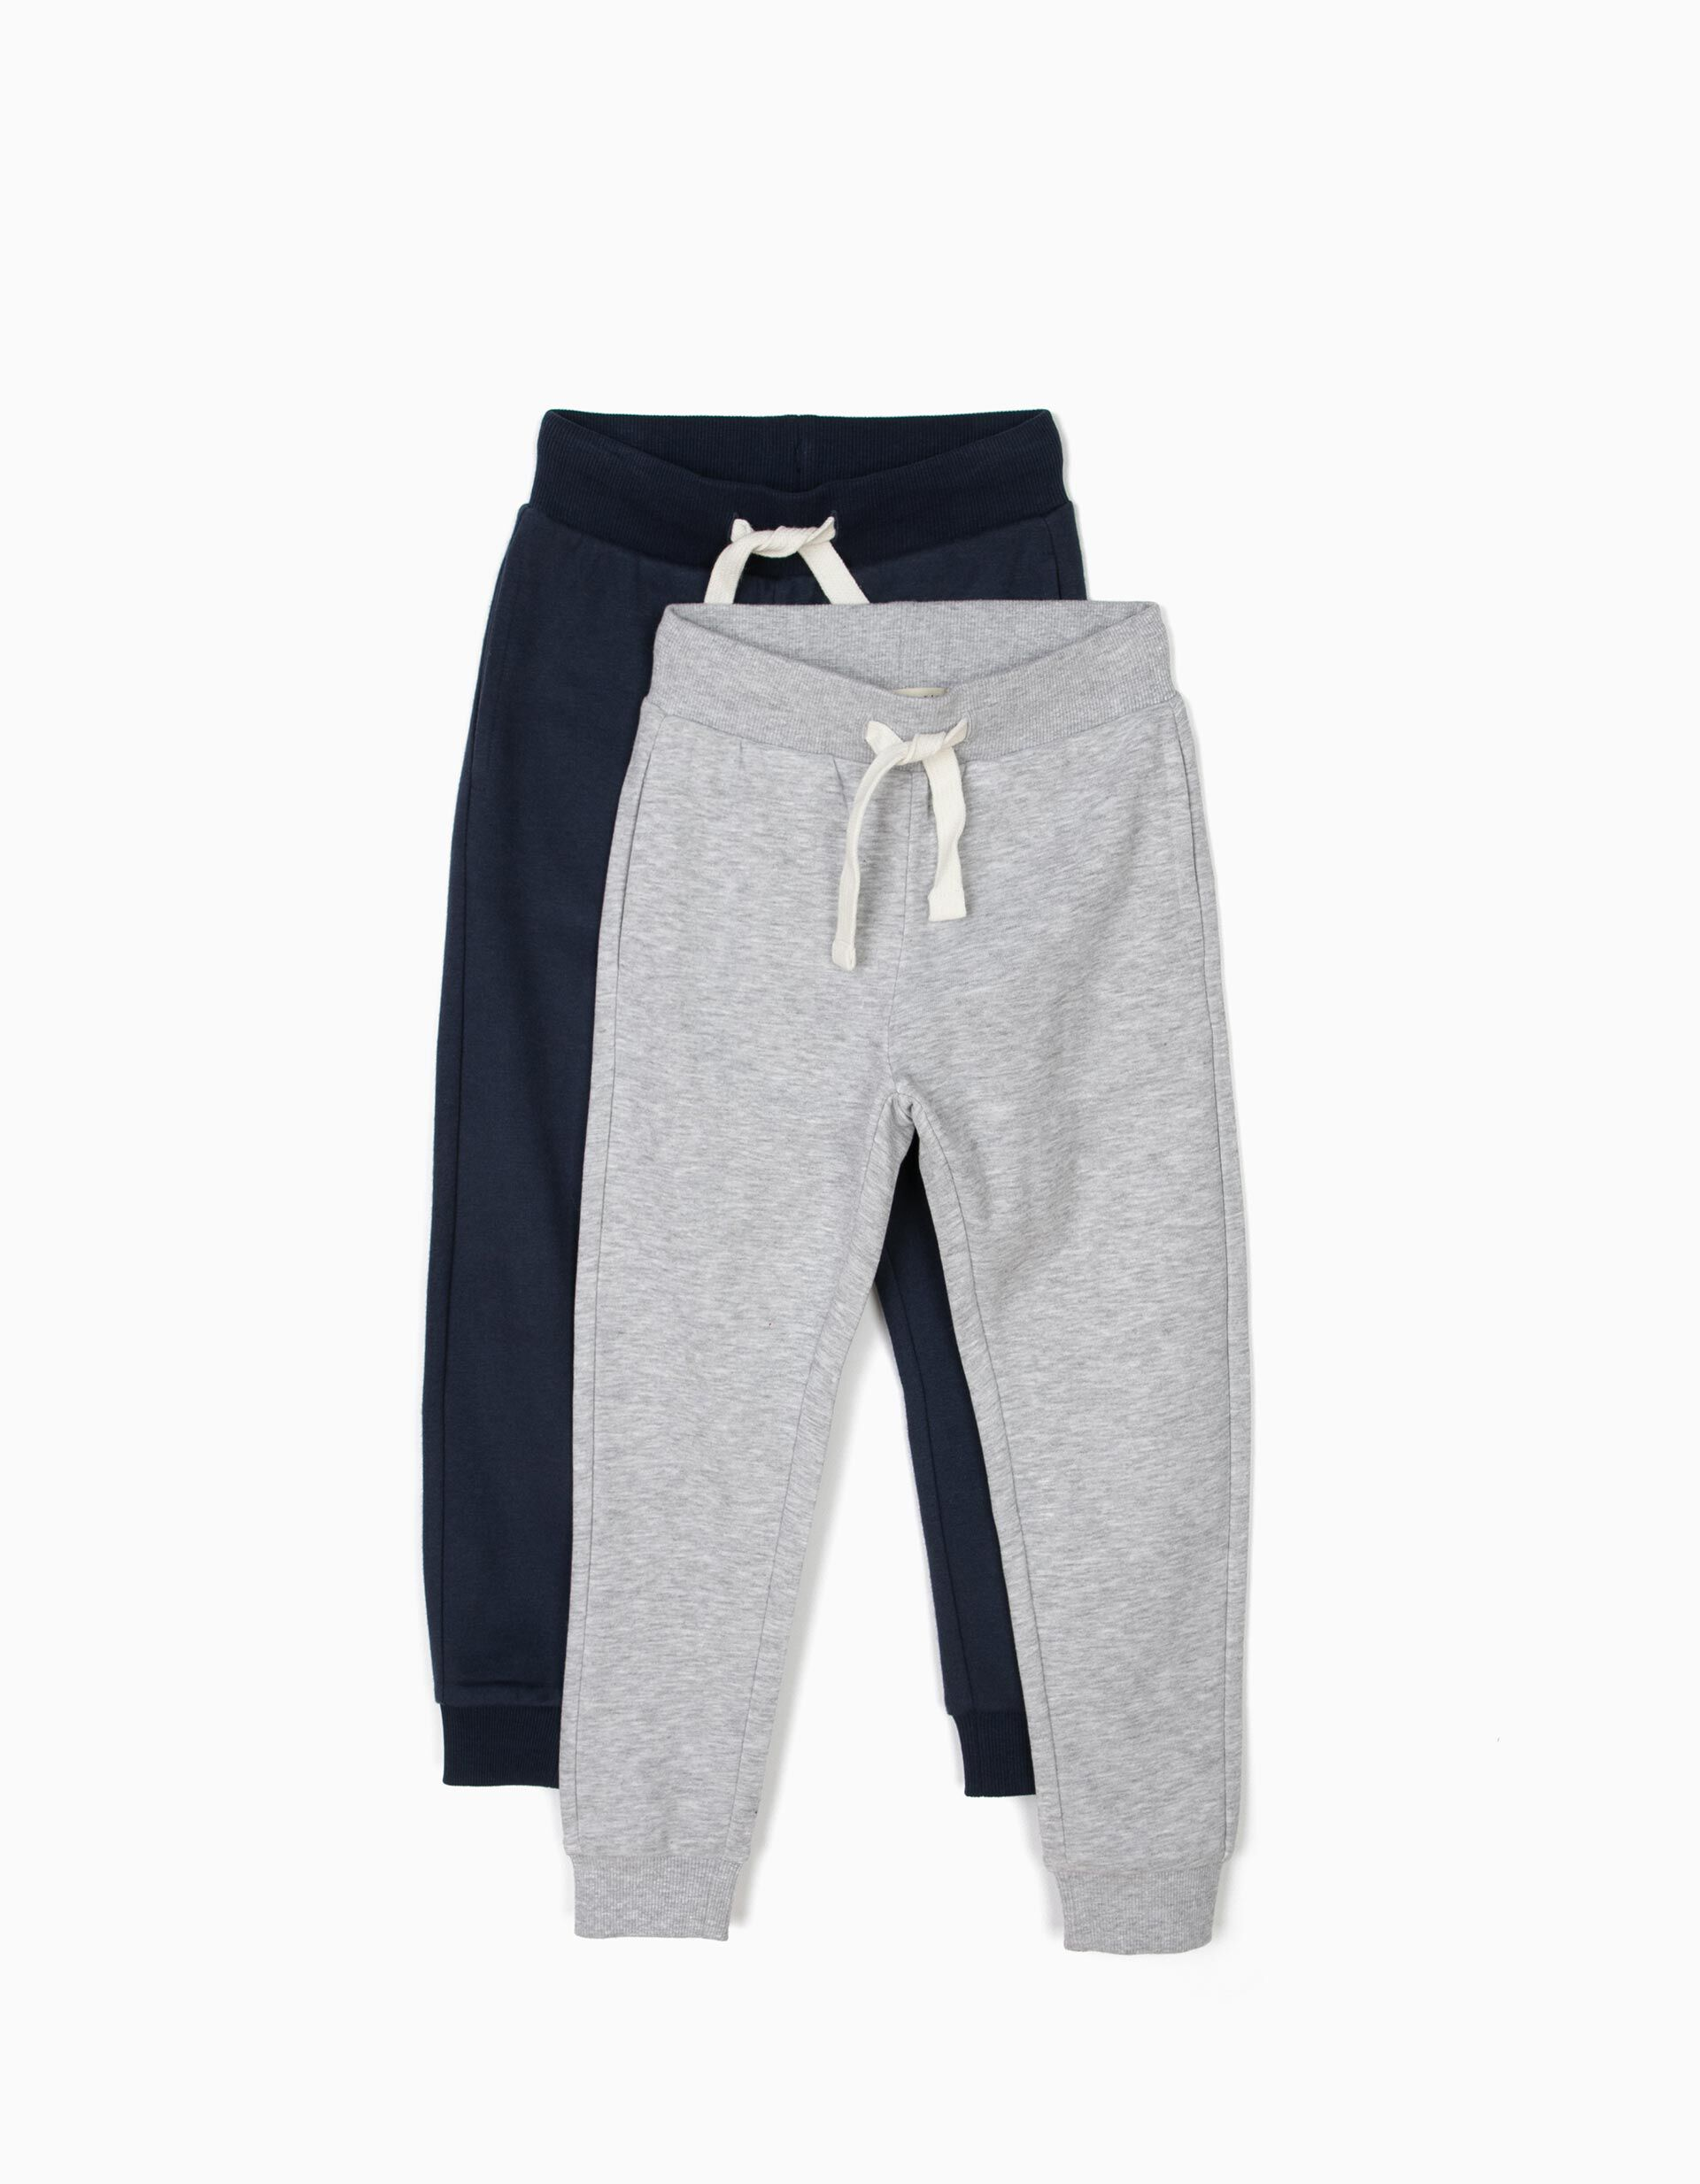 ZIPPY Pantalones para Ni/ños